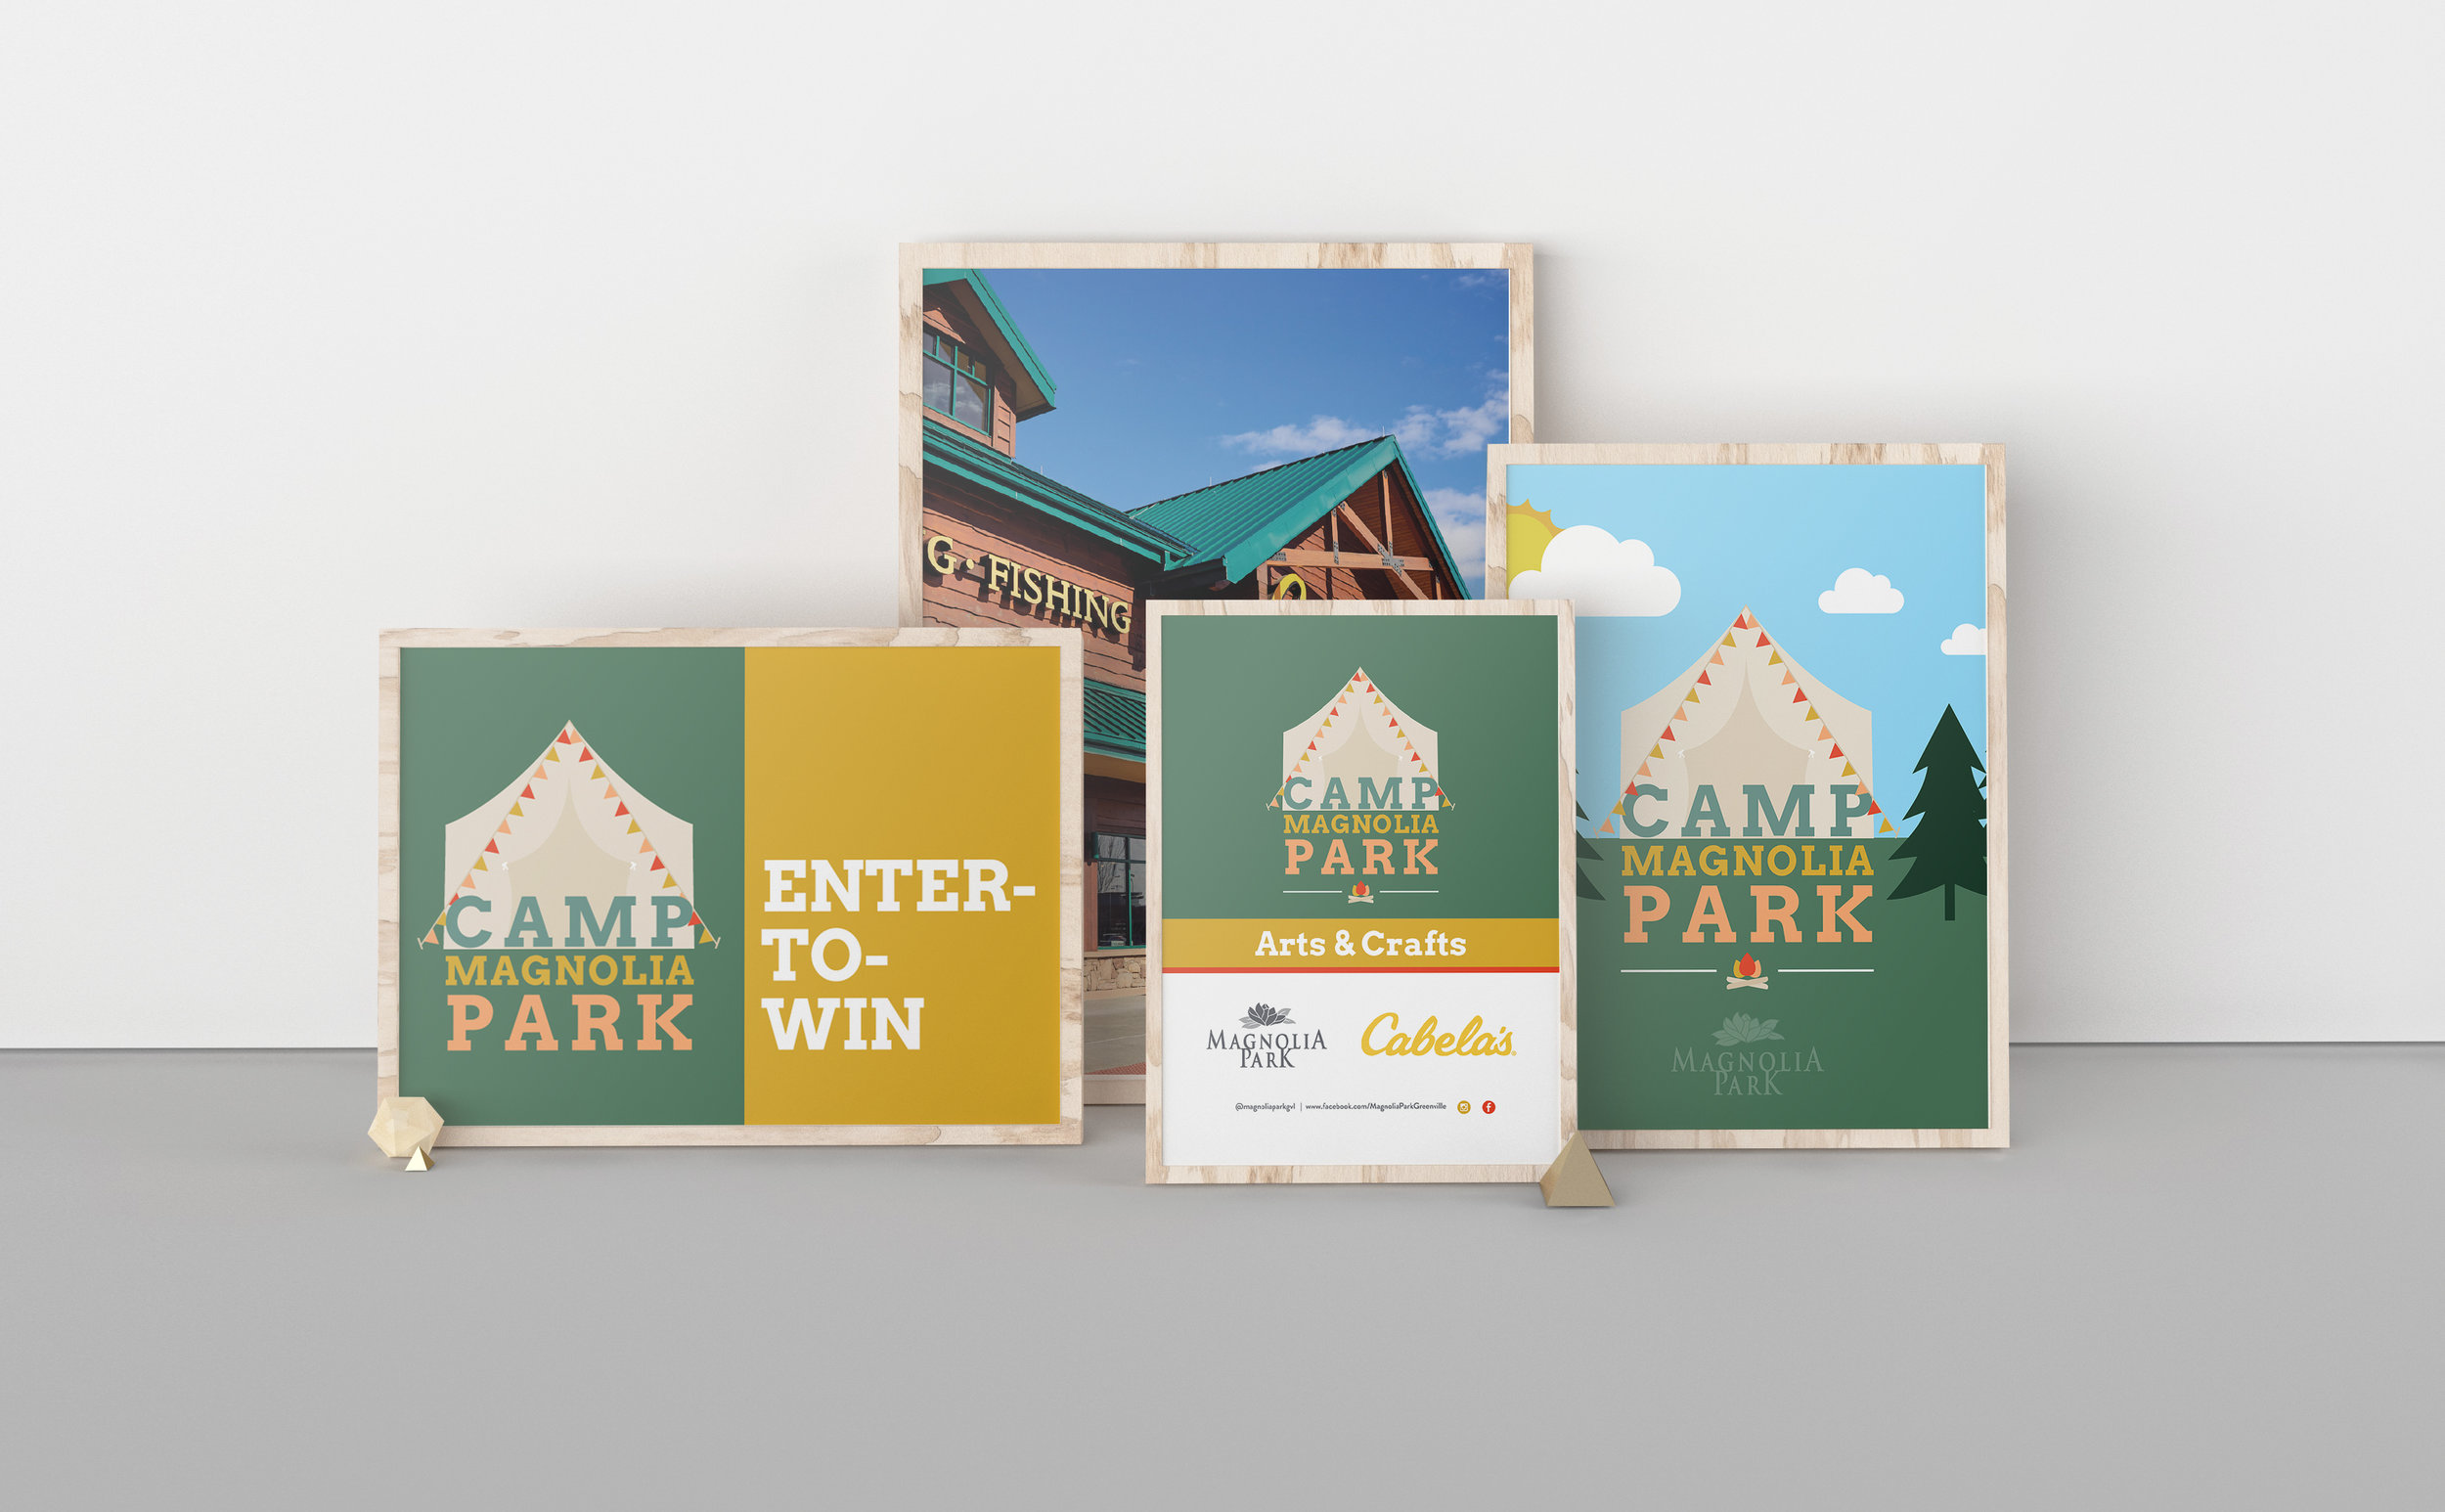 MagPark-CampMagPark.jpg